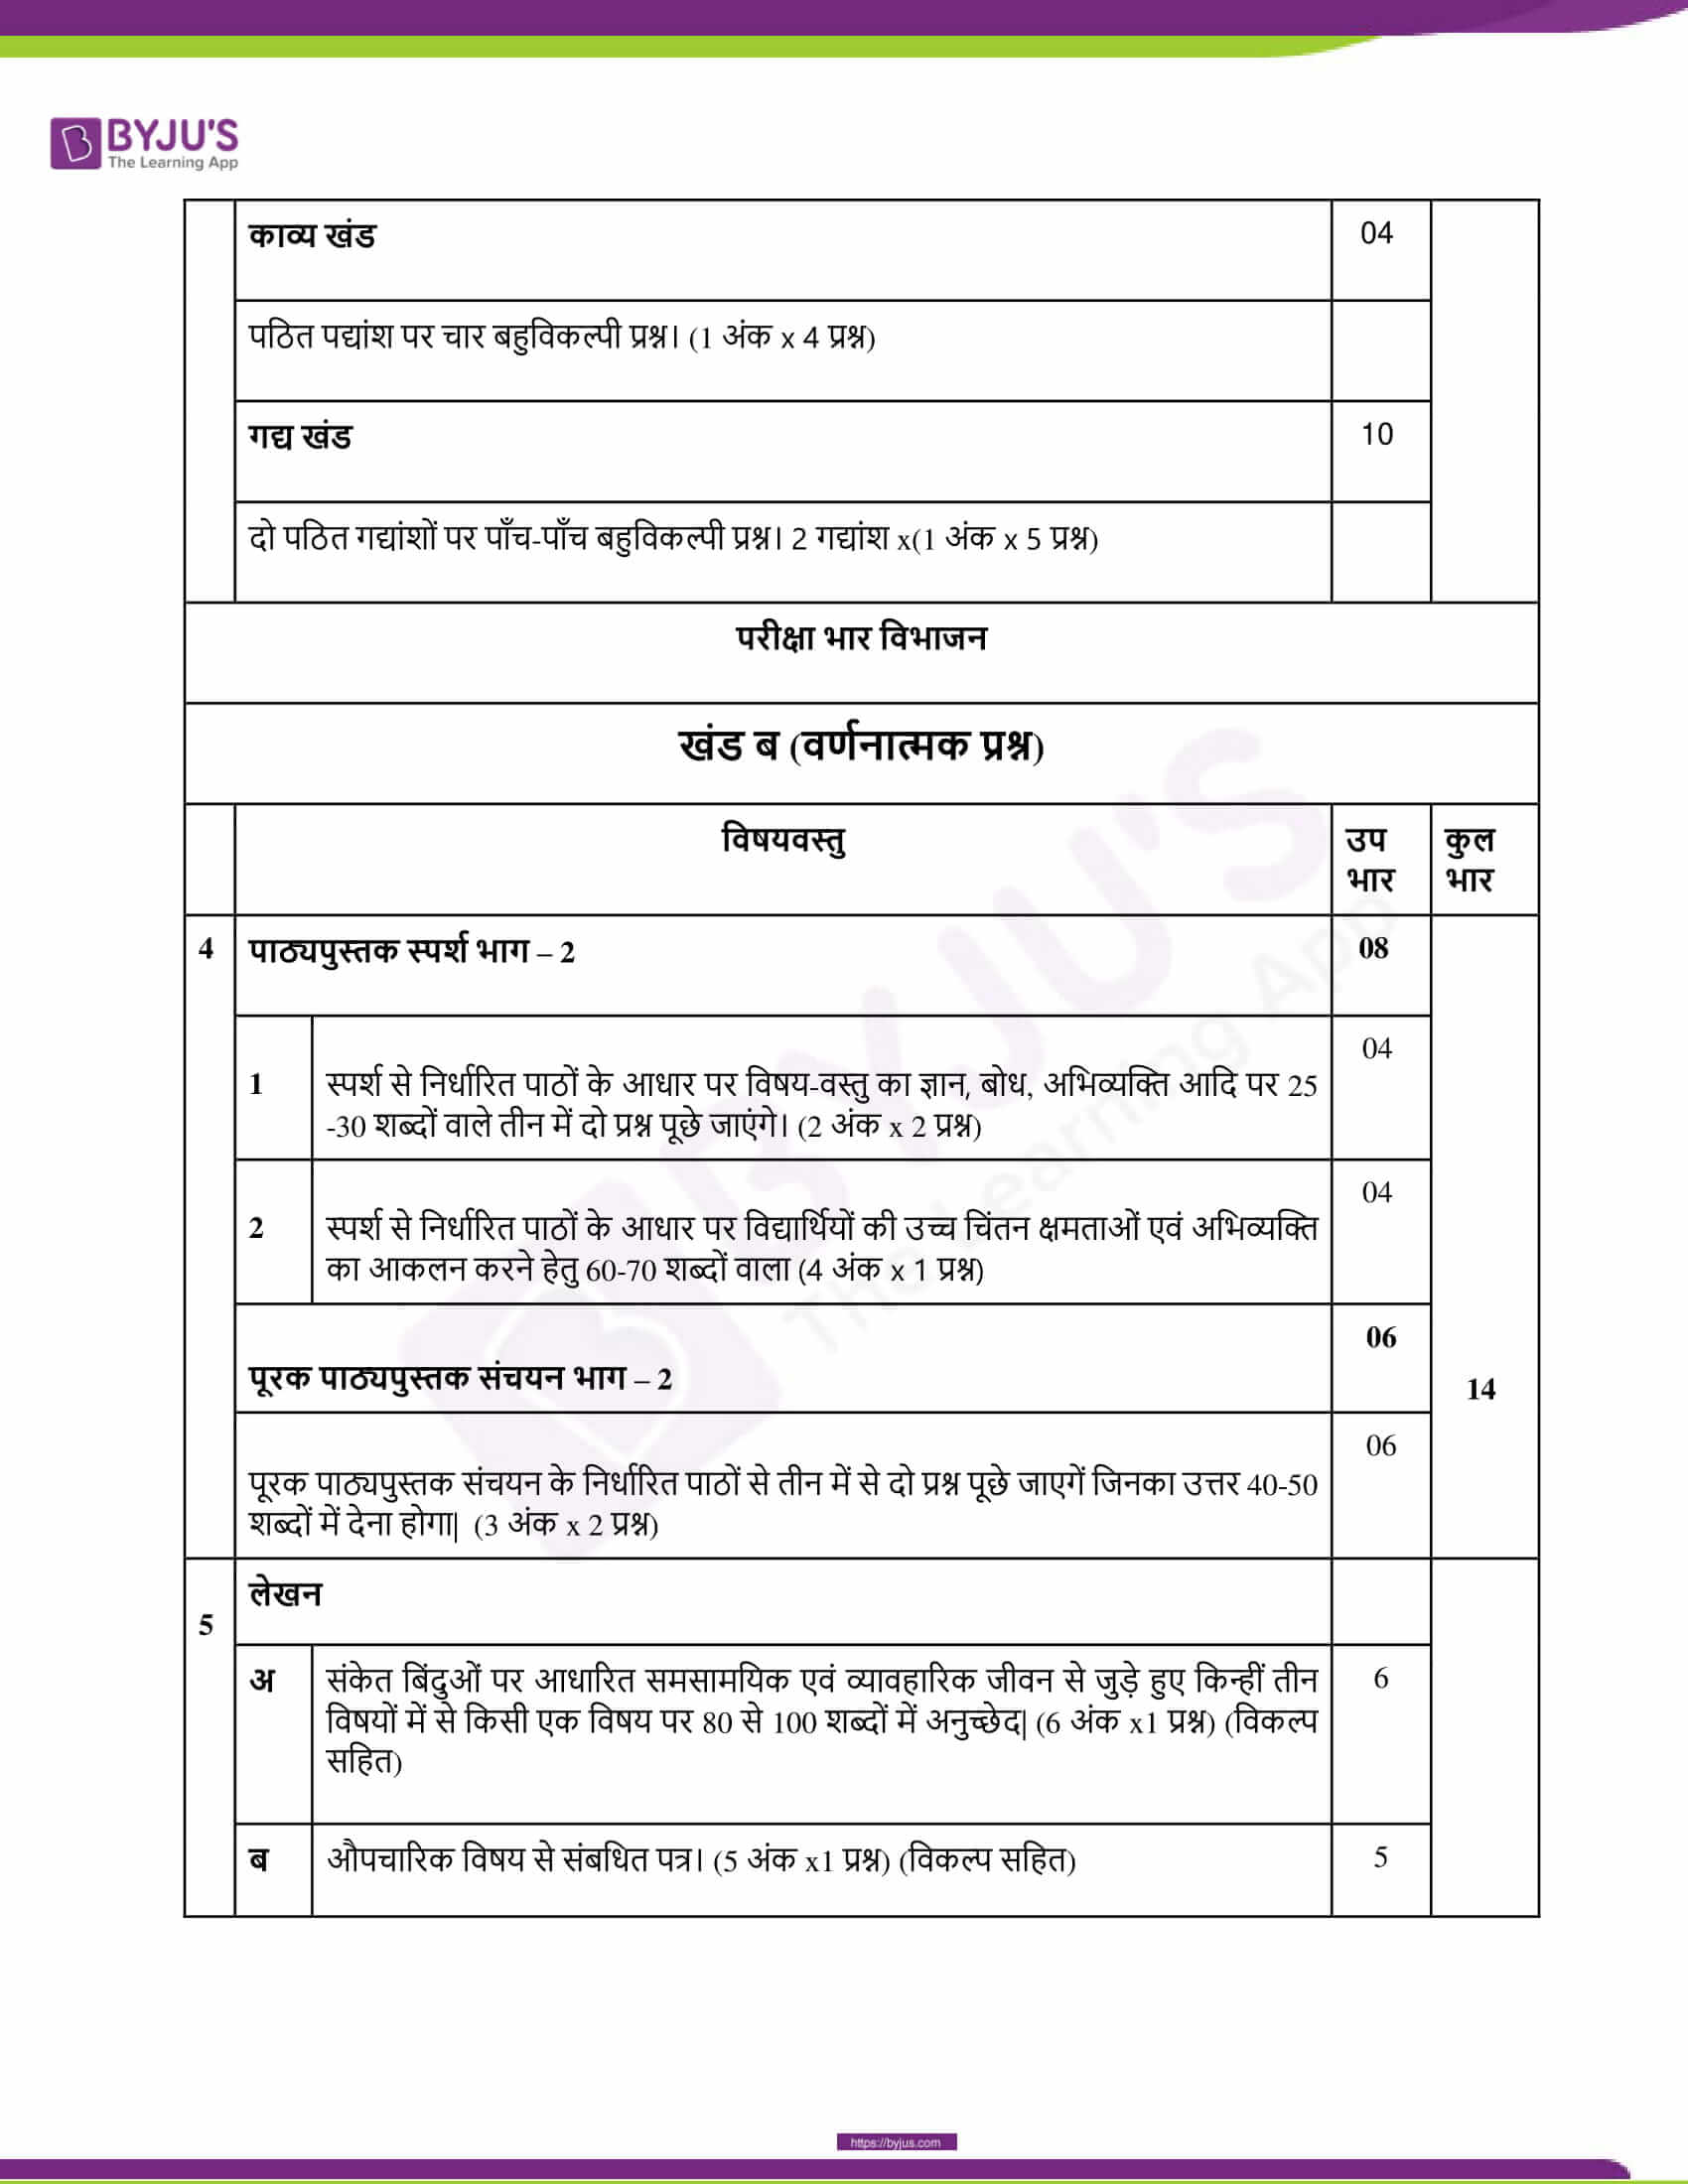 CBSE Class 10 Hindi Course B Revised Syllabus 2020 21 13